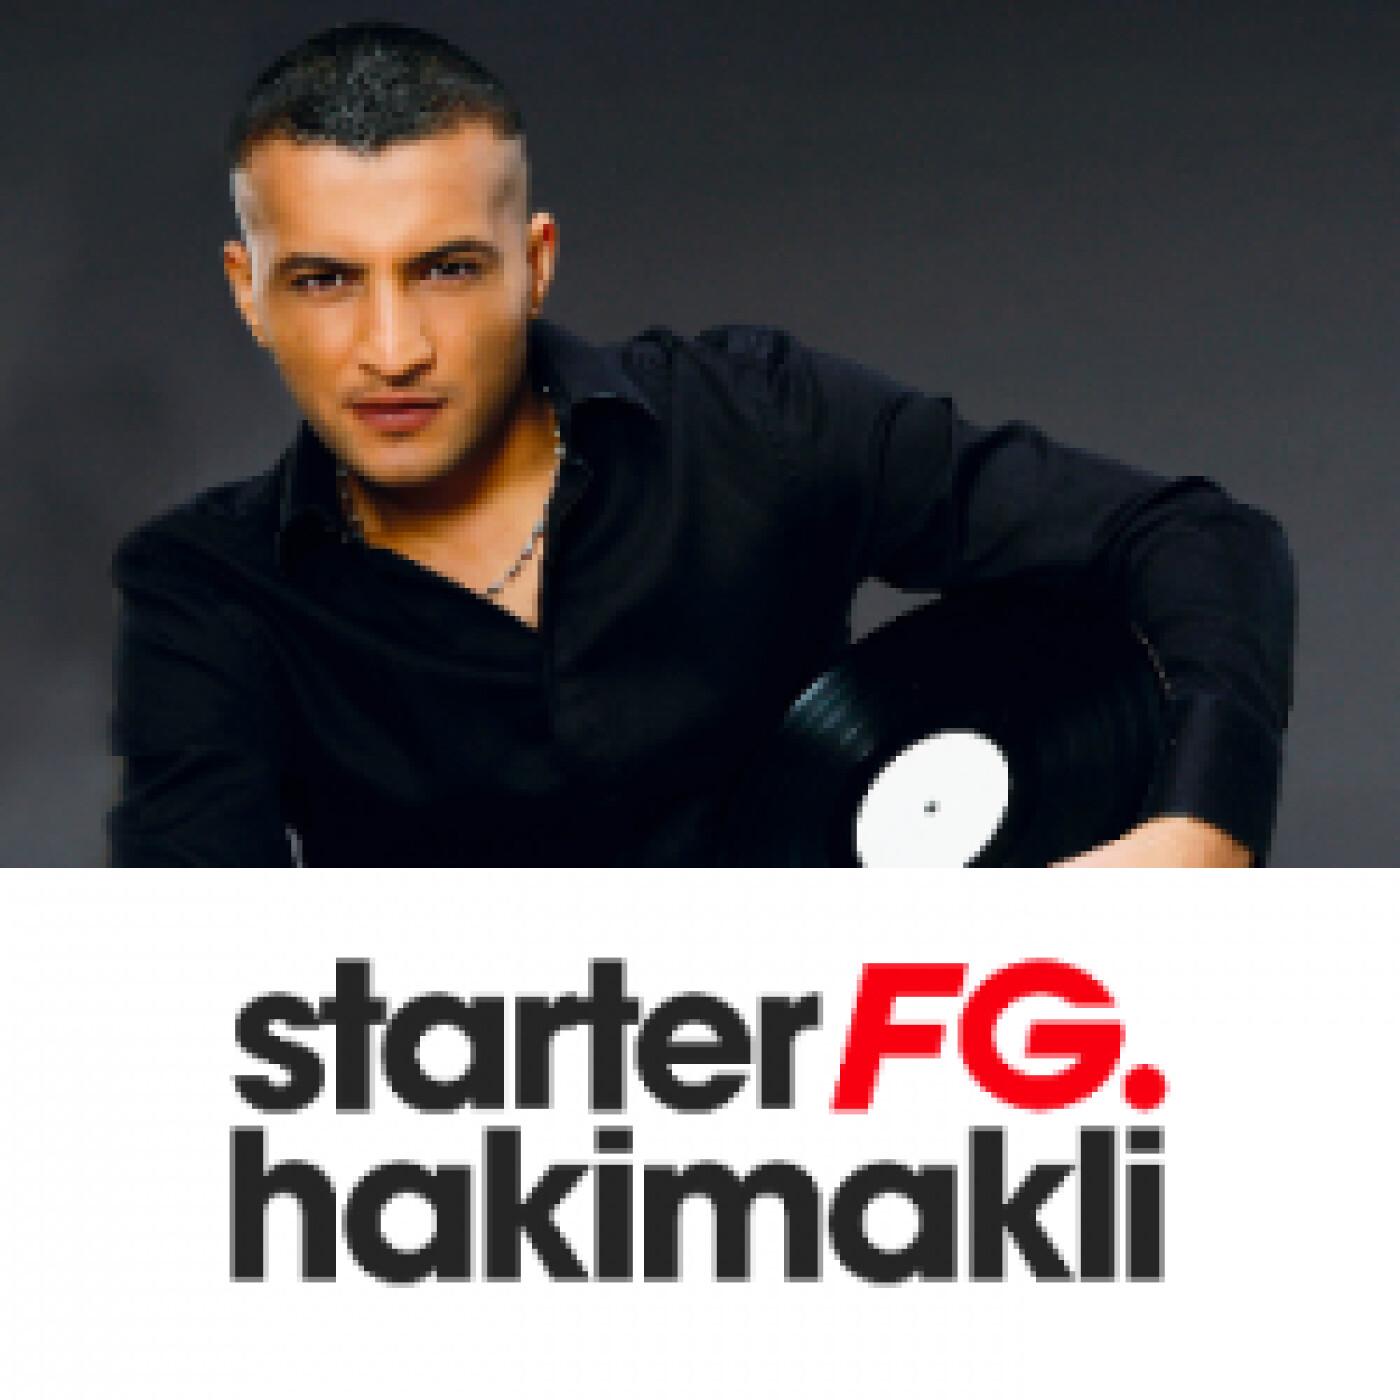 STARTER FG BY HAKIMAKLI MERCREDI 2 JUIN 2021